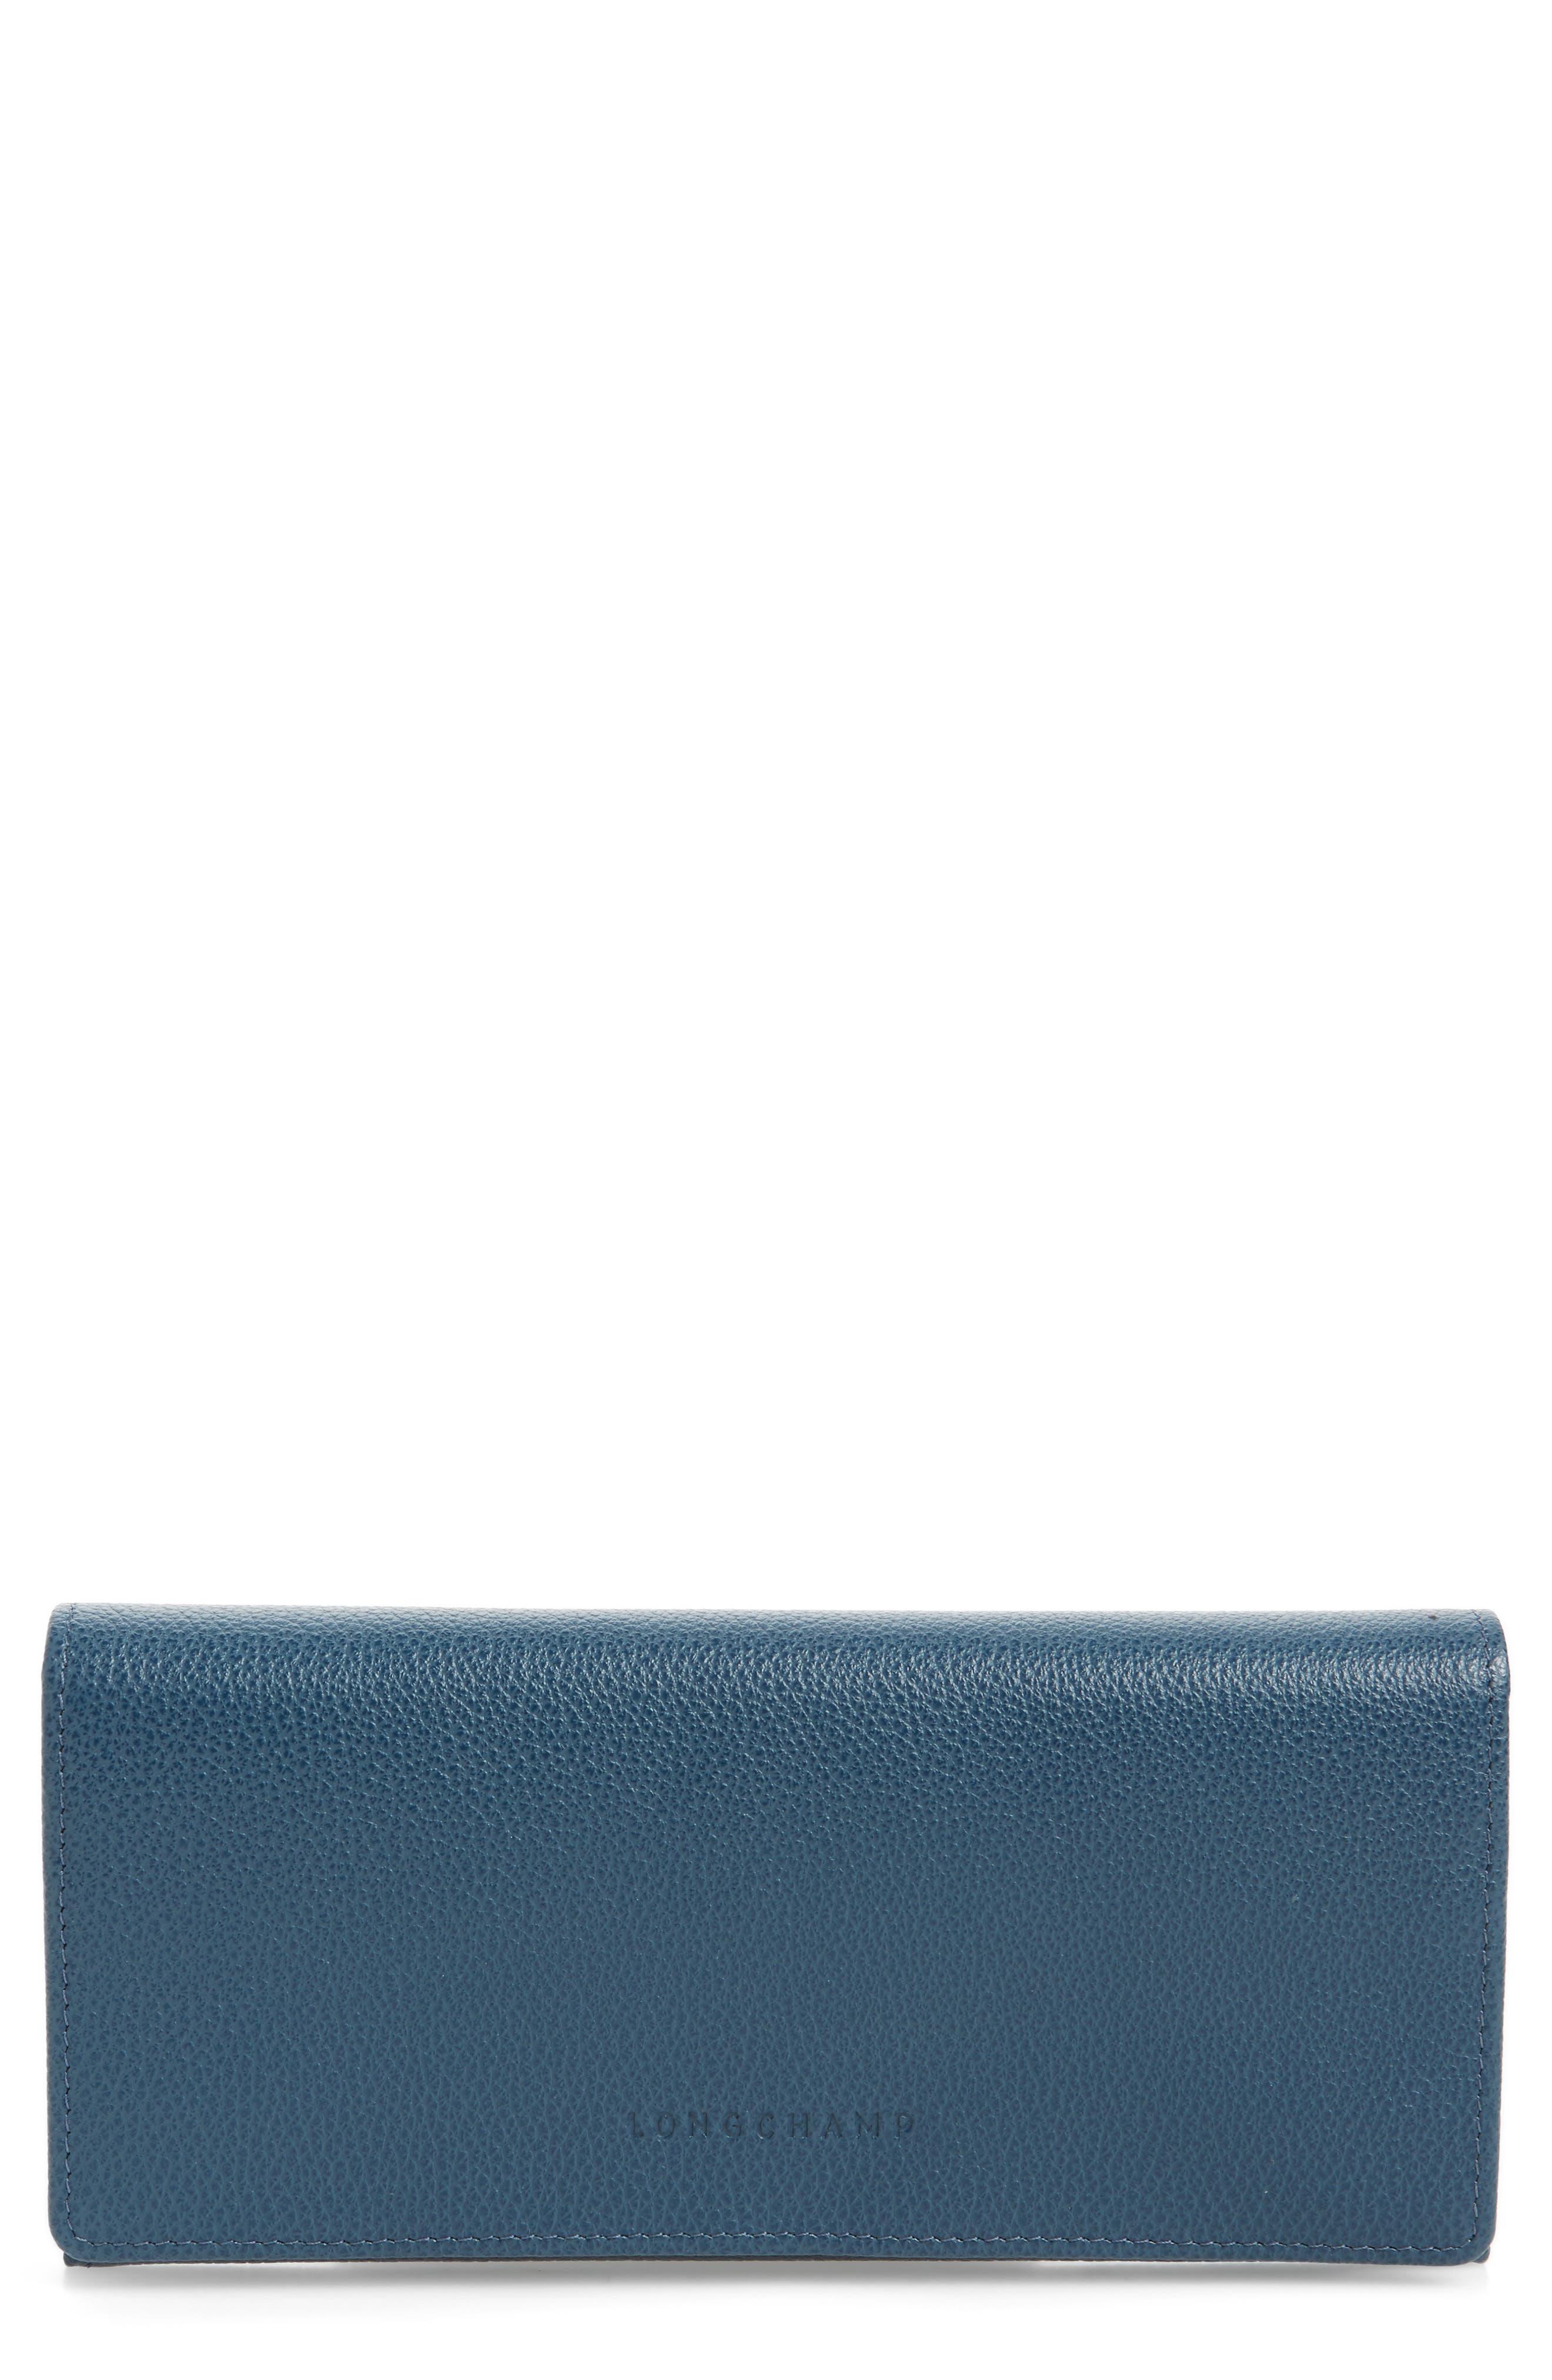 Alternate Image 1 Selected - Longchamp 'Veau Foulonne' Continental Wallet